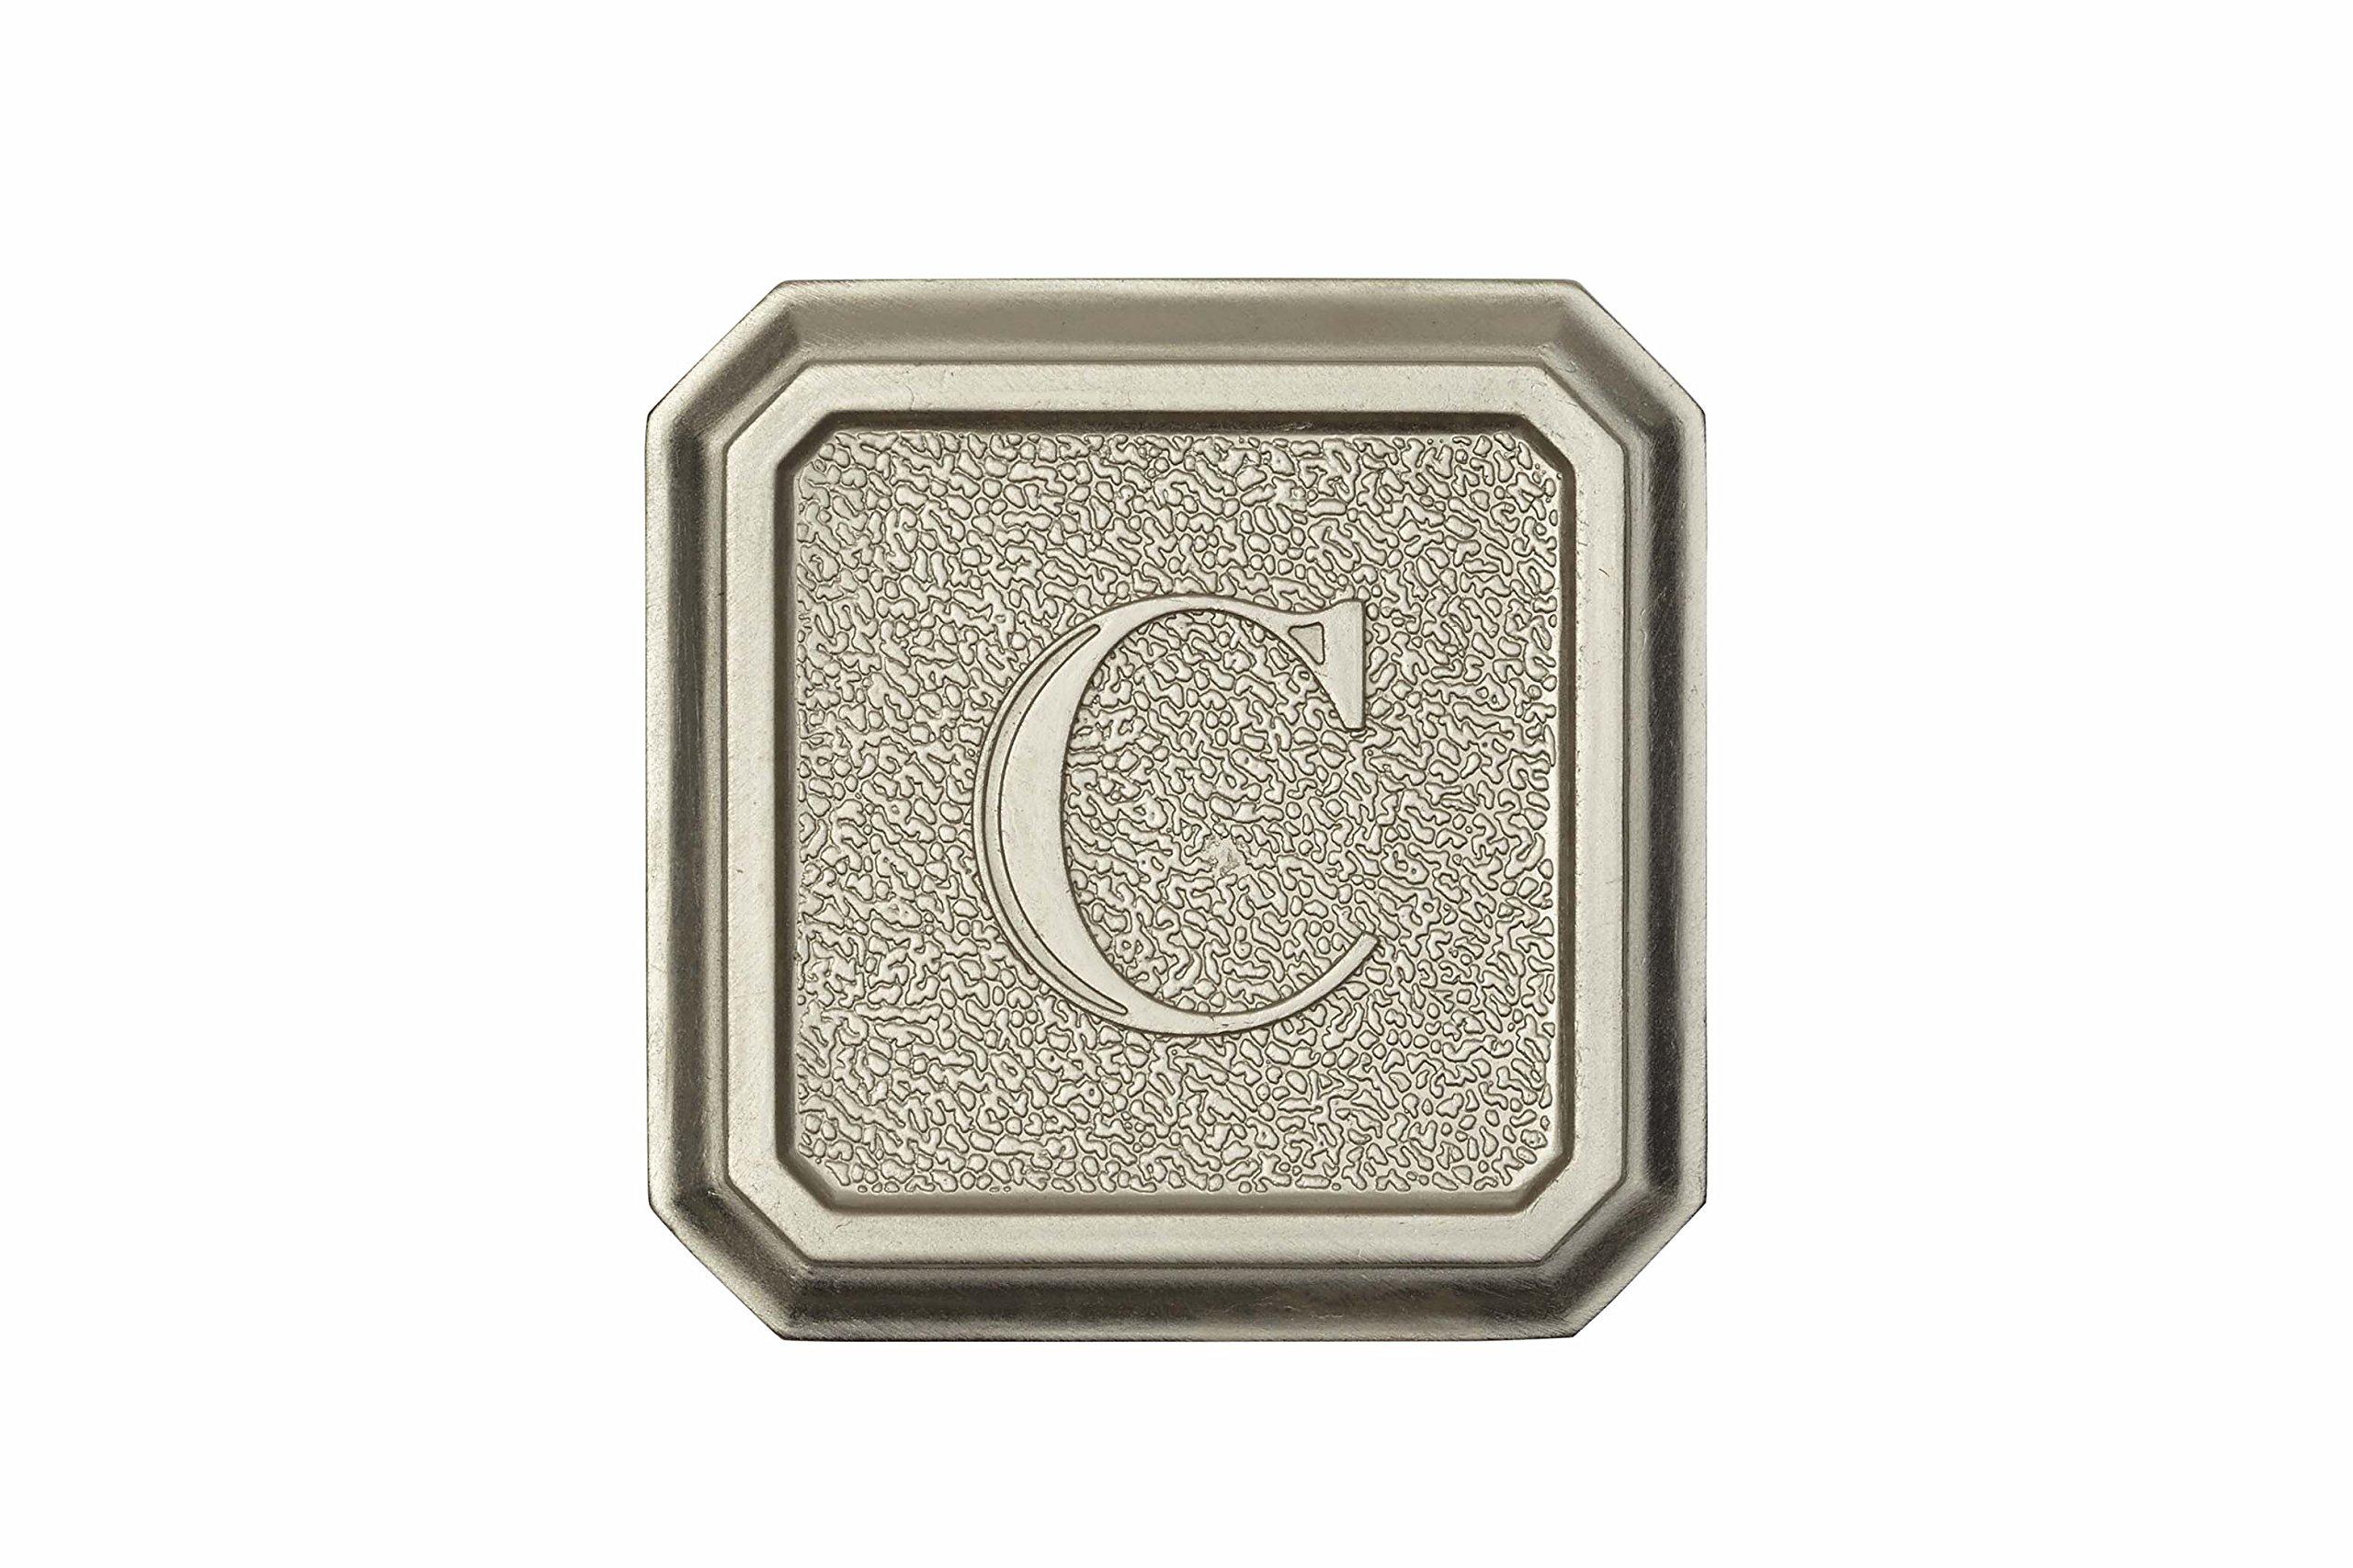 Architectural Mailboxes 3650SN-C Aluminum Satin Nickel Monogram - Letter''C'' by ARCHITECTURAL MAILBOXES